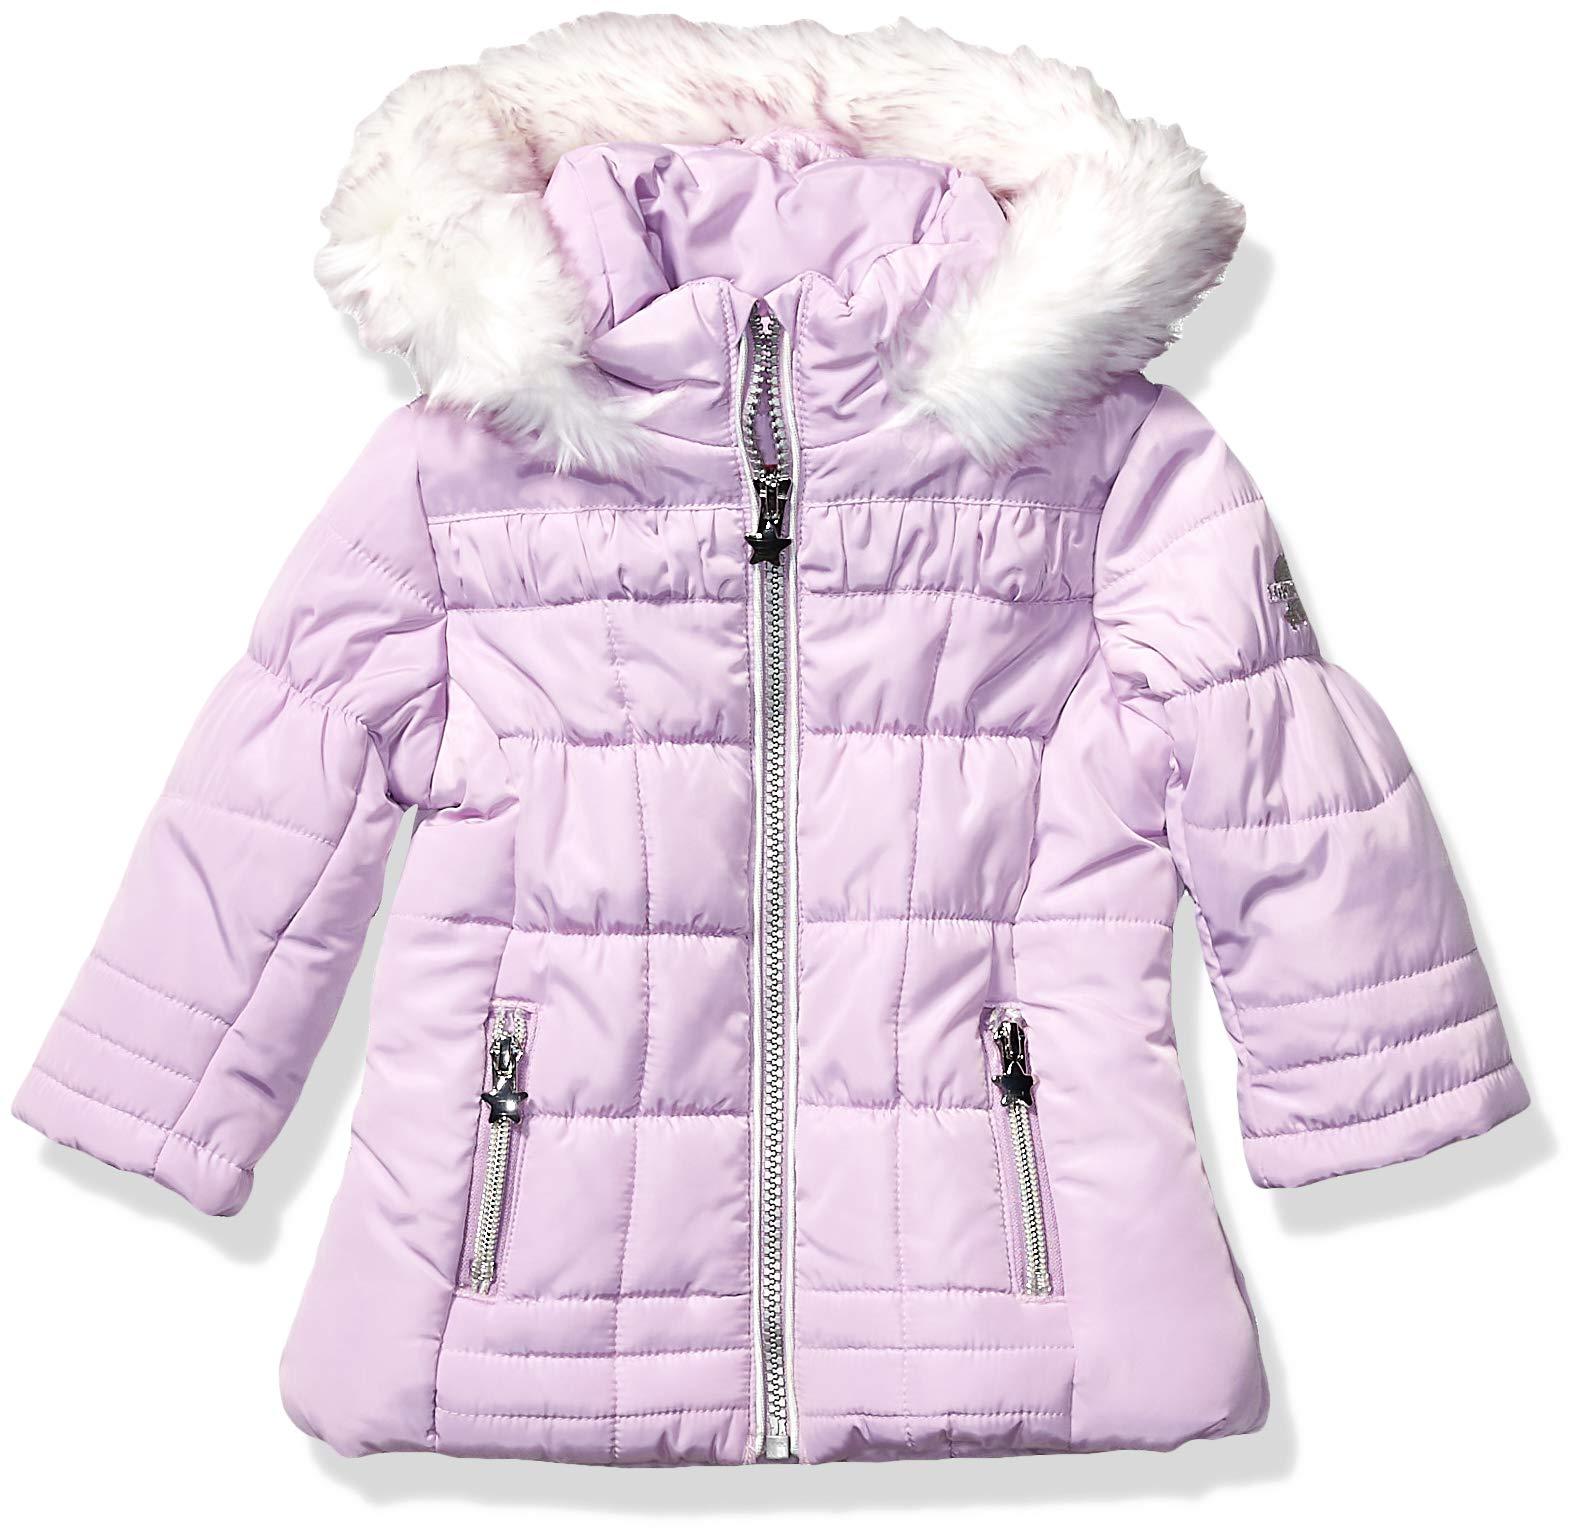 London Fog Baby Girls Matte Shimmer Satin Faux Fur Bottom and Hood Jacket, Princess Purple, 24Mo by London Fog